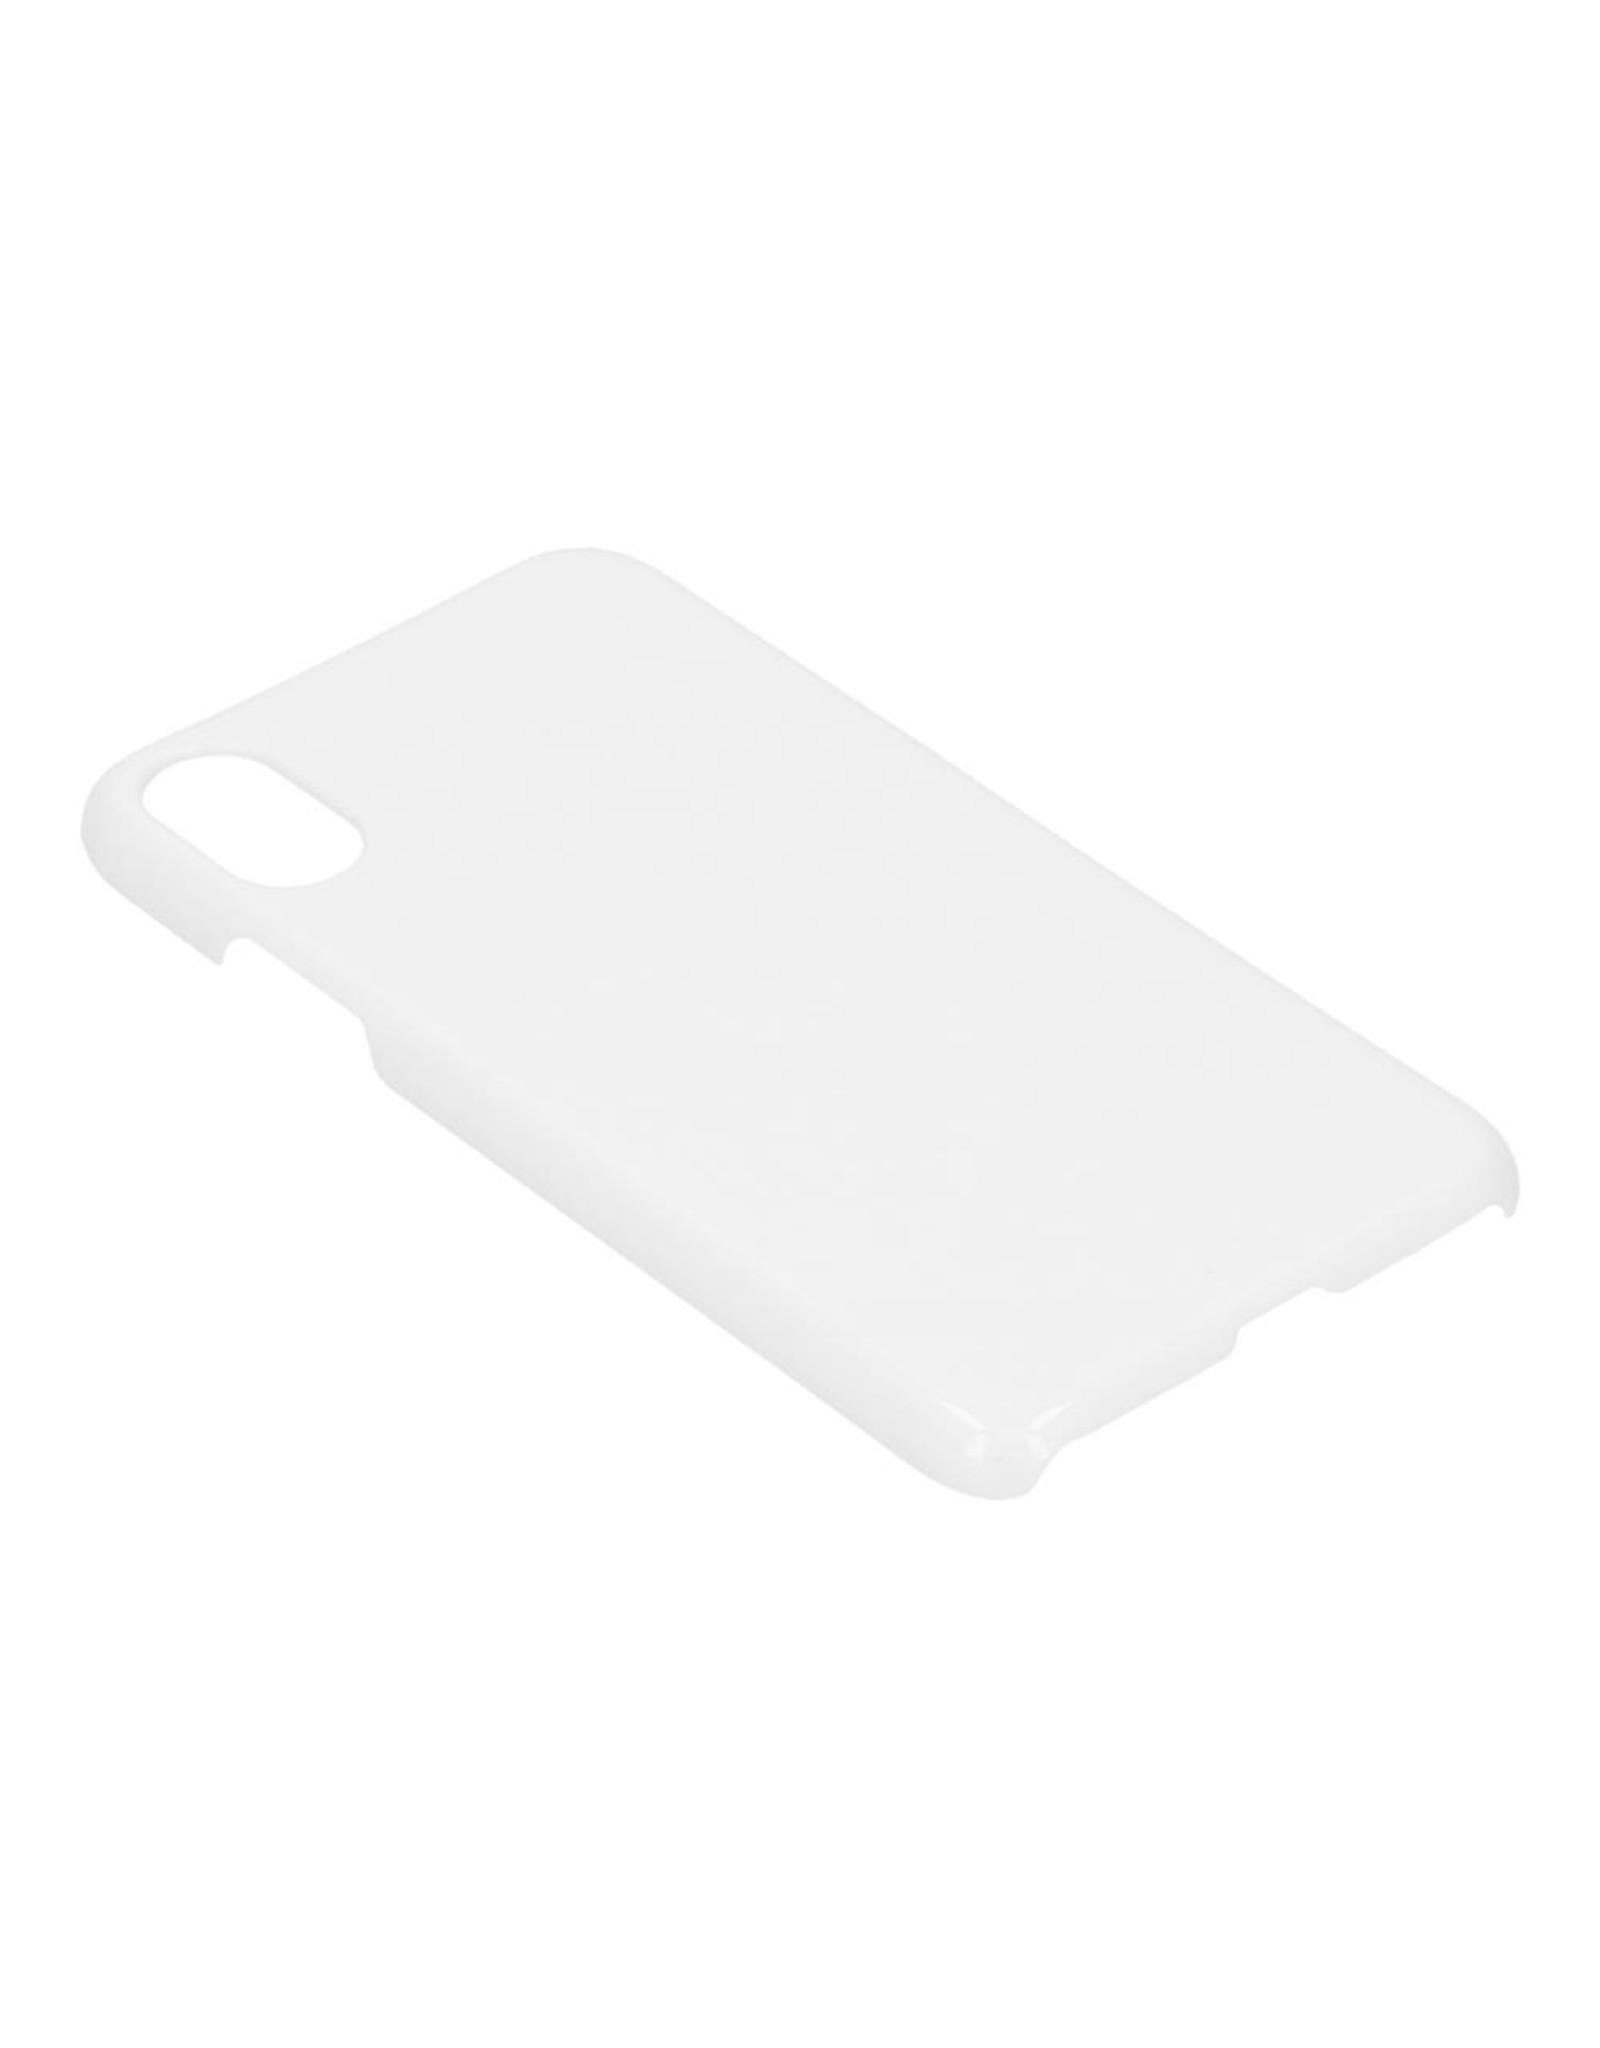 3D iPhone X